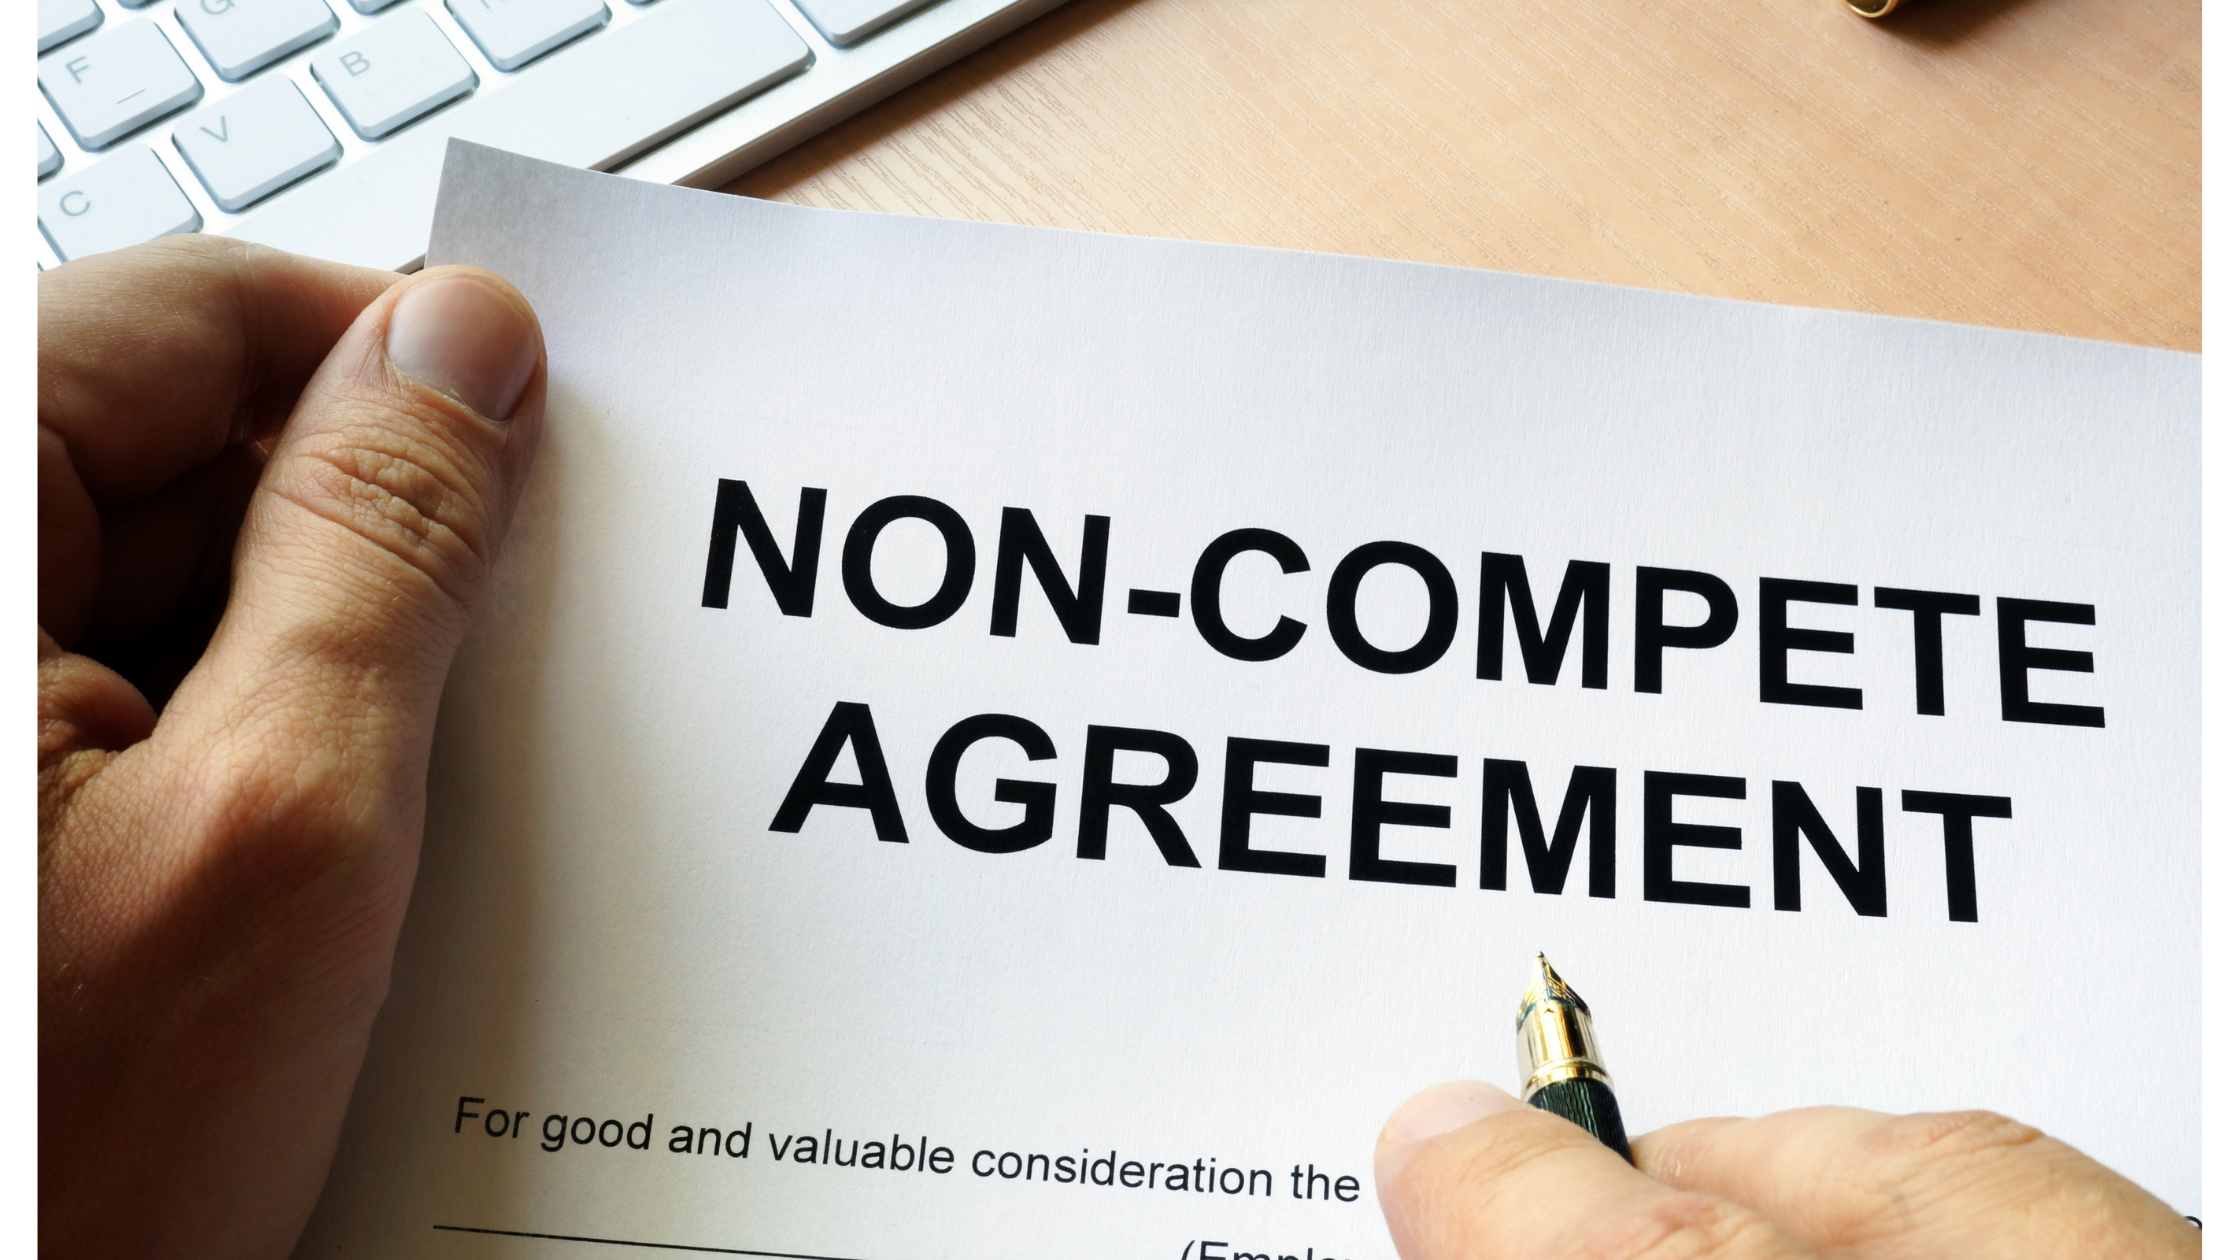 Enforcement of Noncompete Agreements